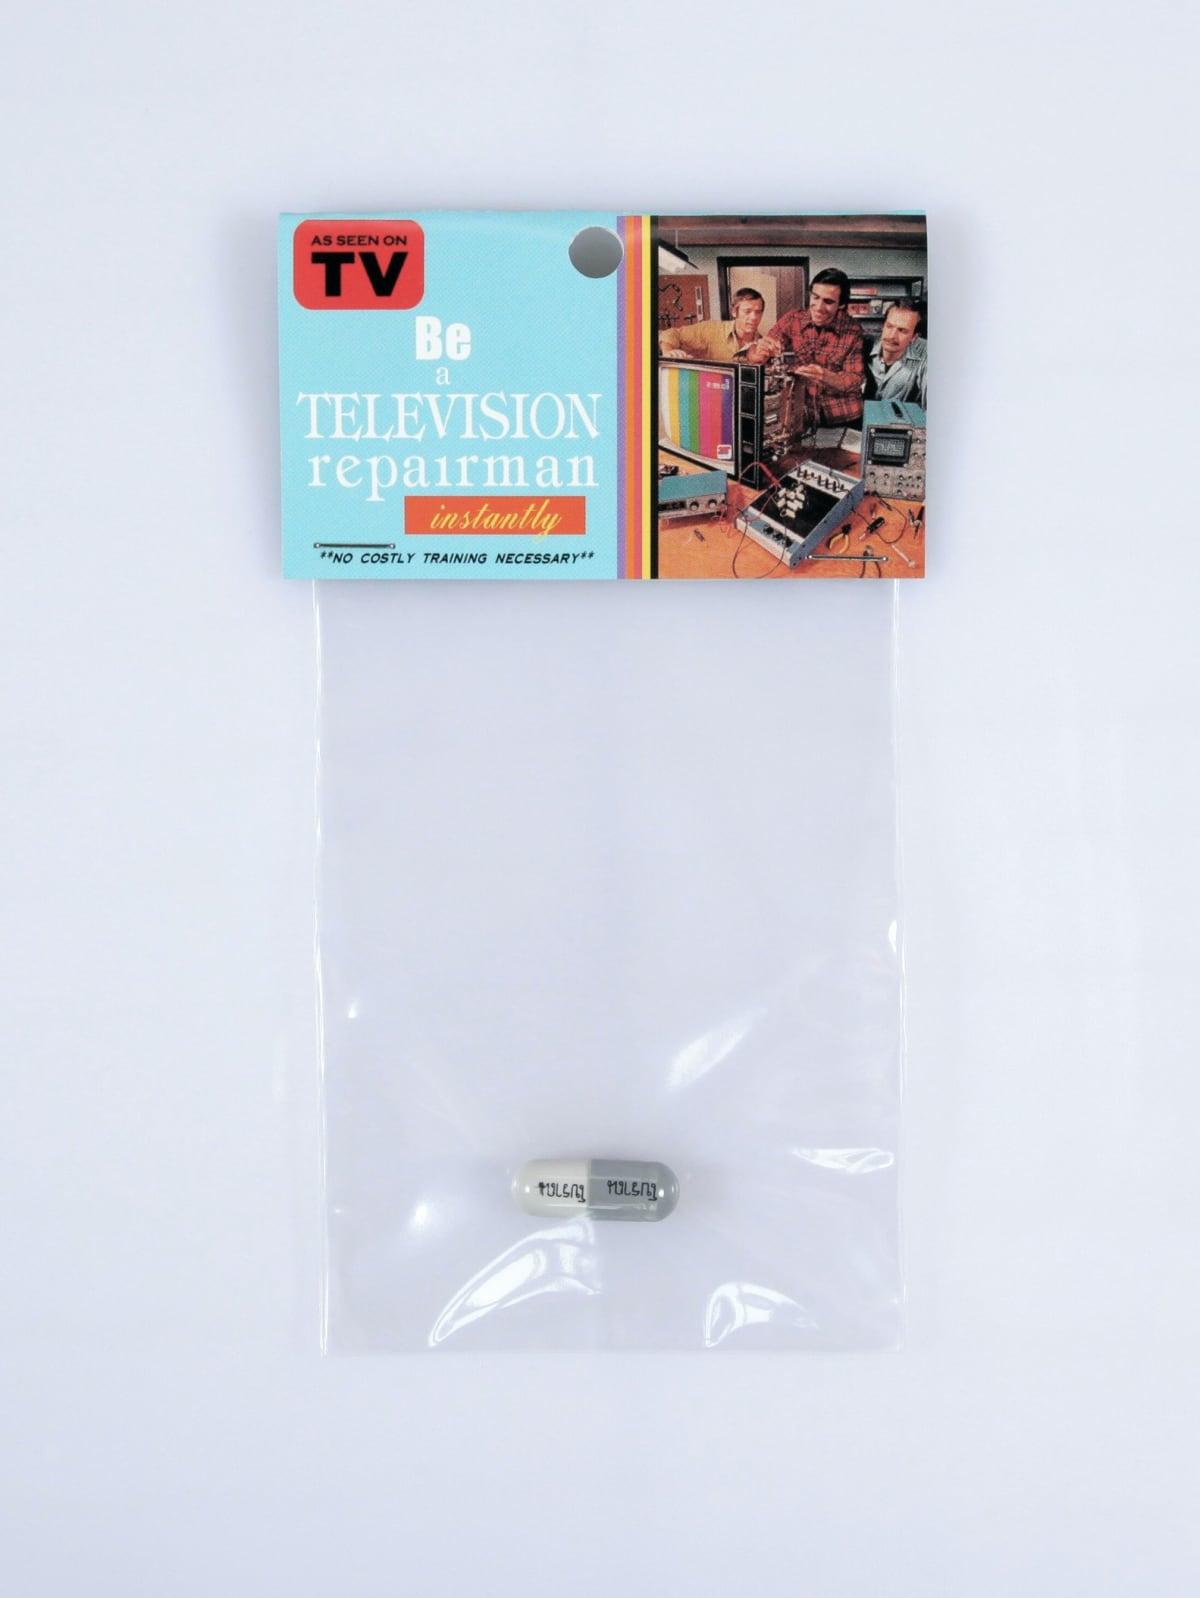 Be a television repairman, 2003